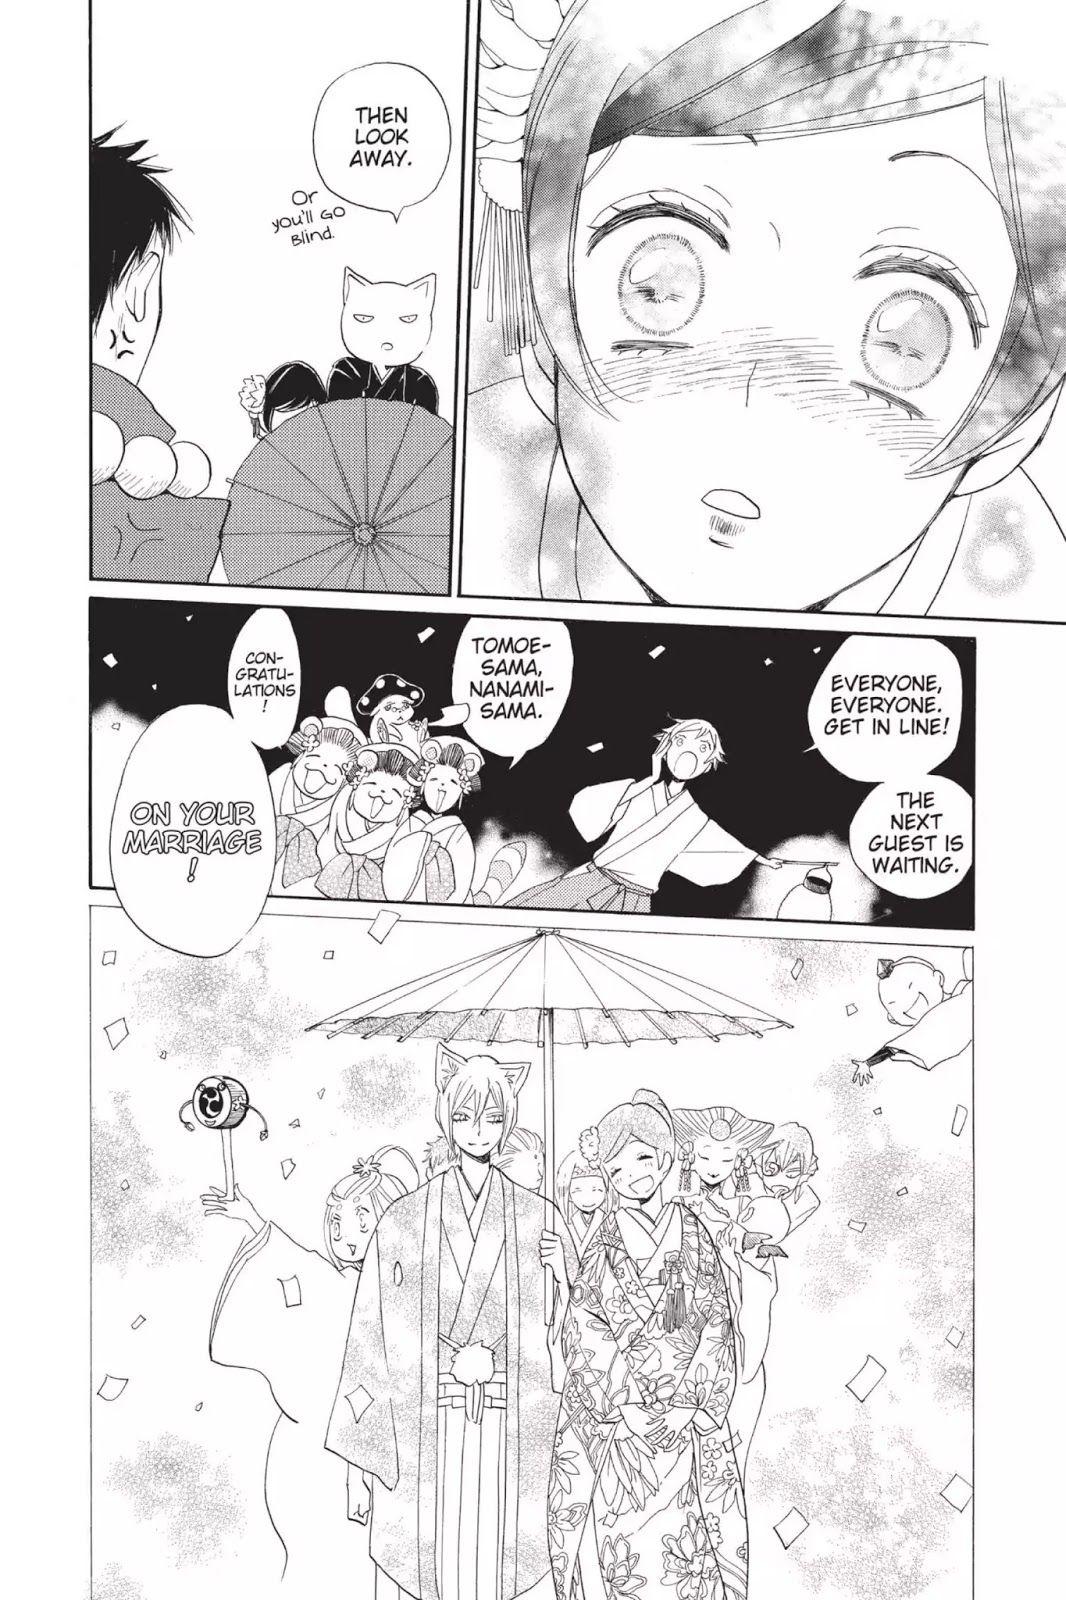 Pin On Manga Anime Games